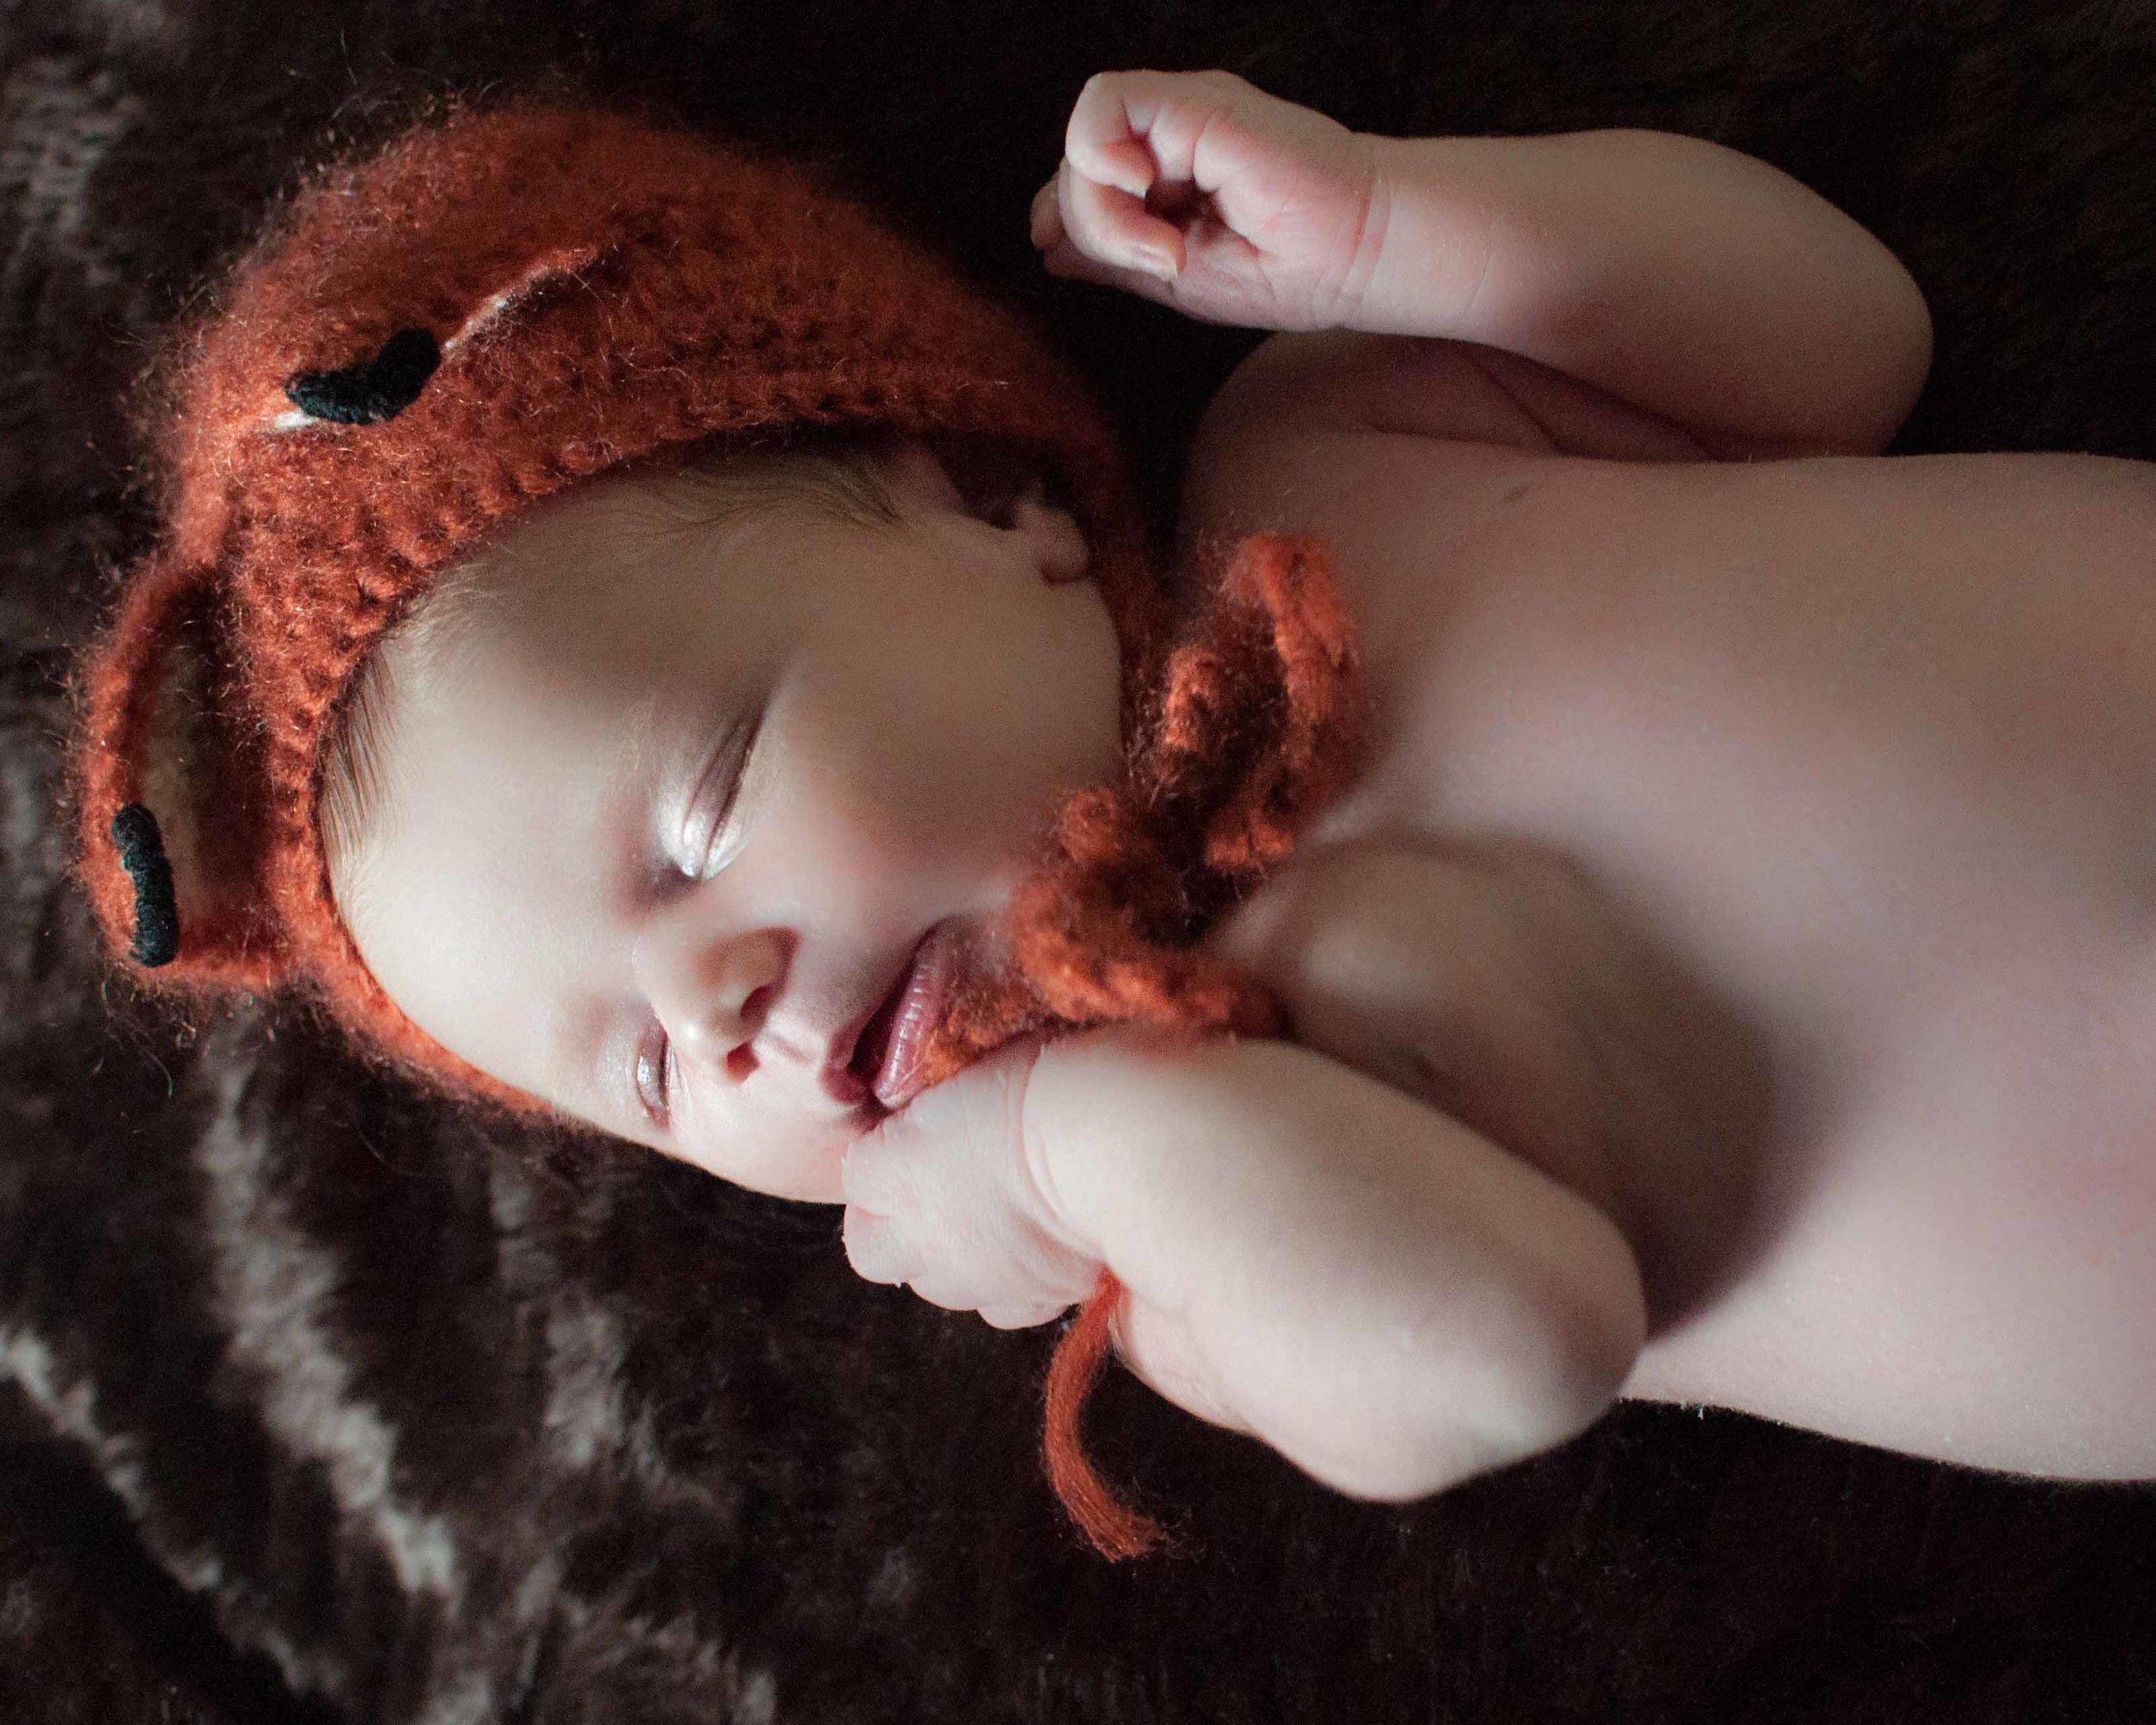 2015-11-08 Baby Olive no watermark small-0391.jpg